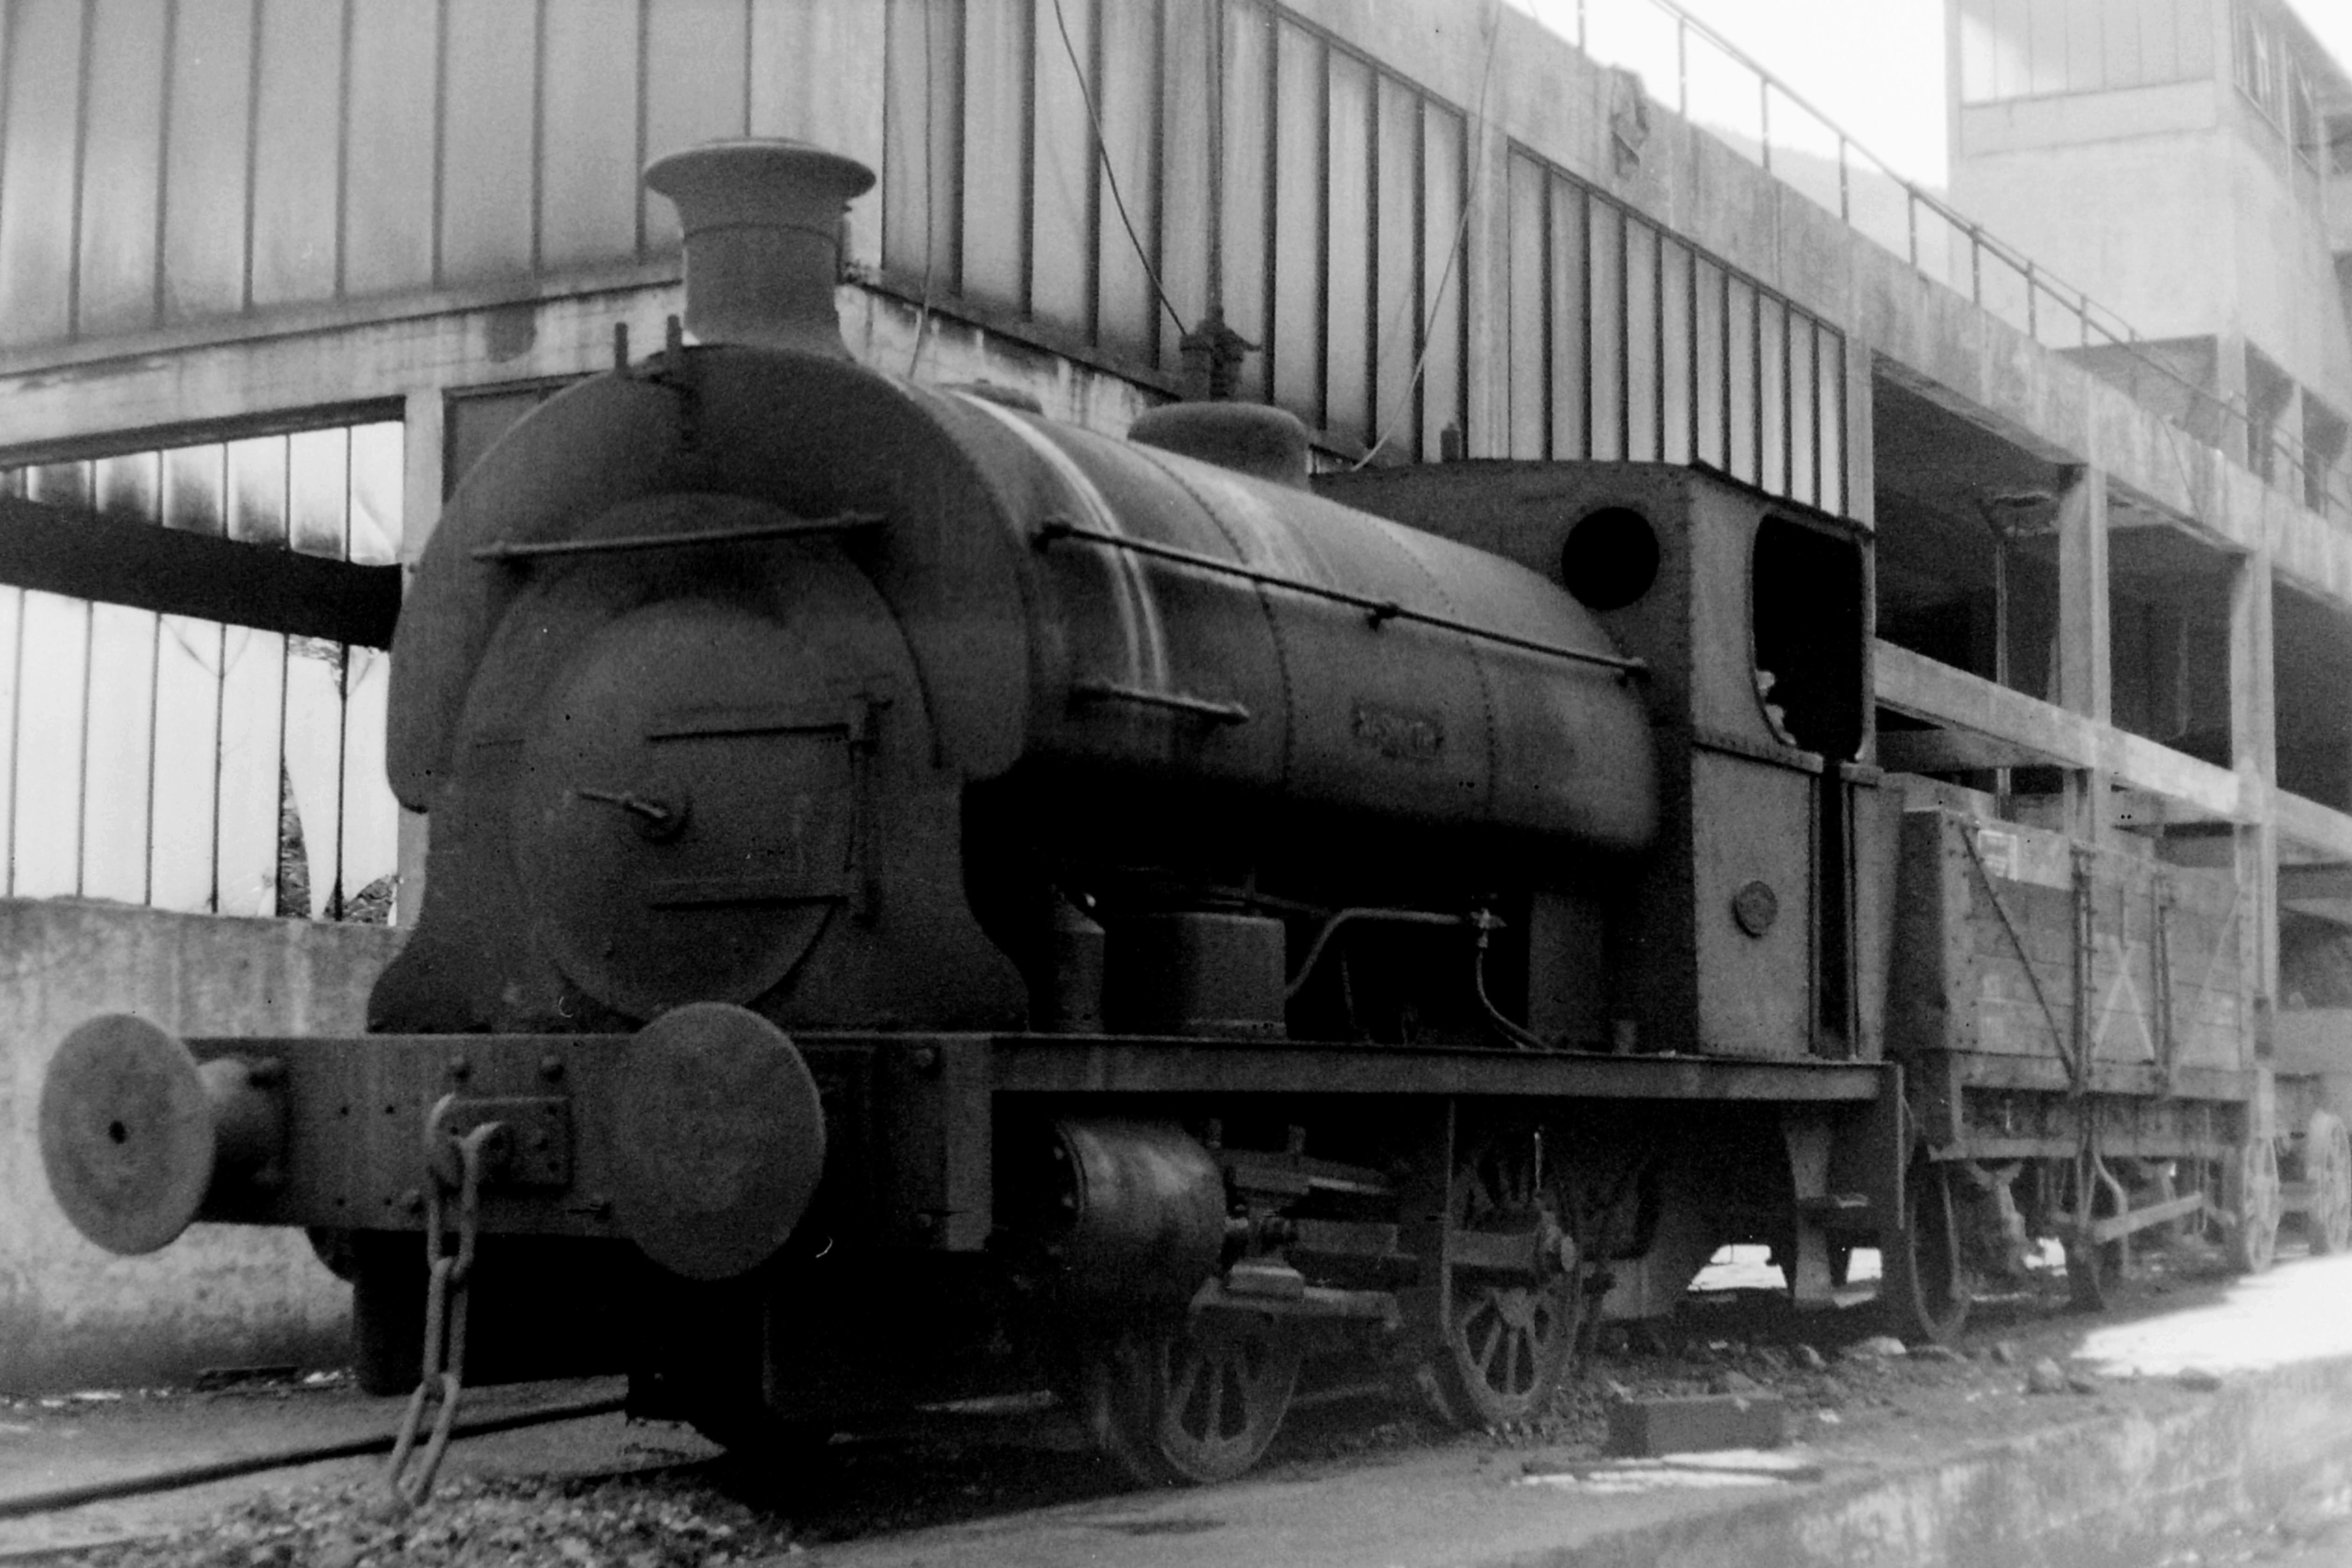 File:Ebbw Vale Steelworks 2 Peckett 1465 & 1524 (5582093744).jpg